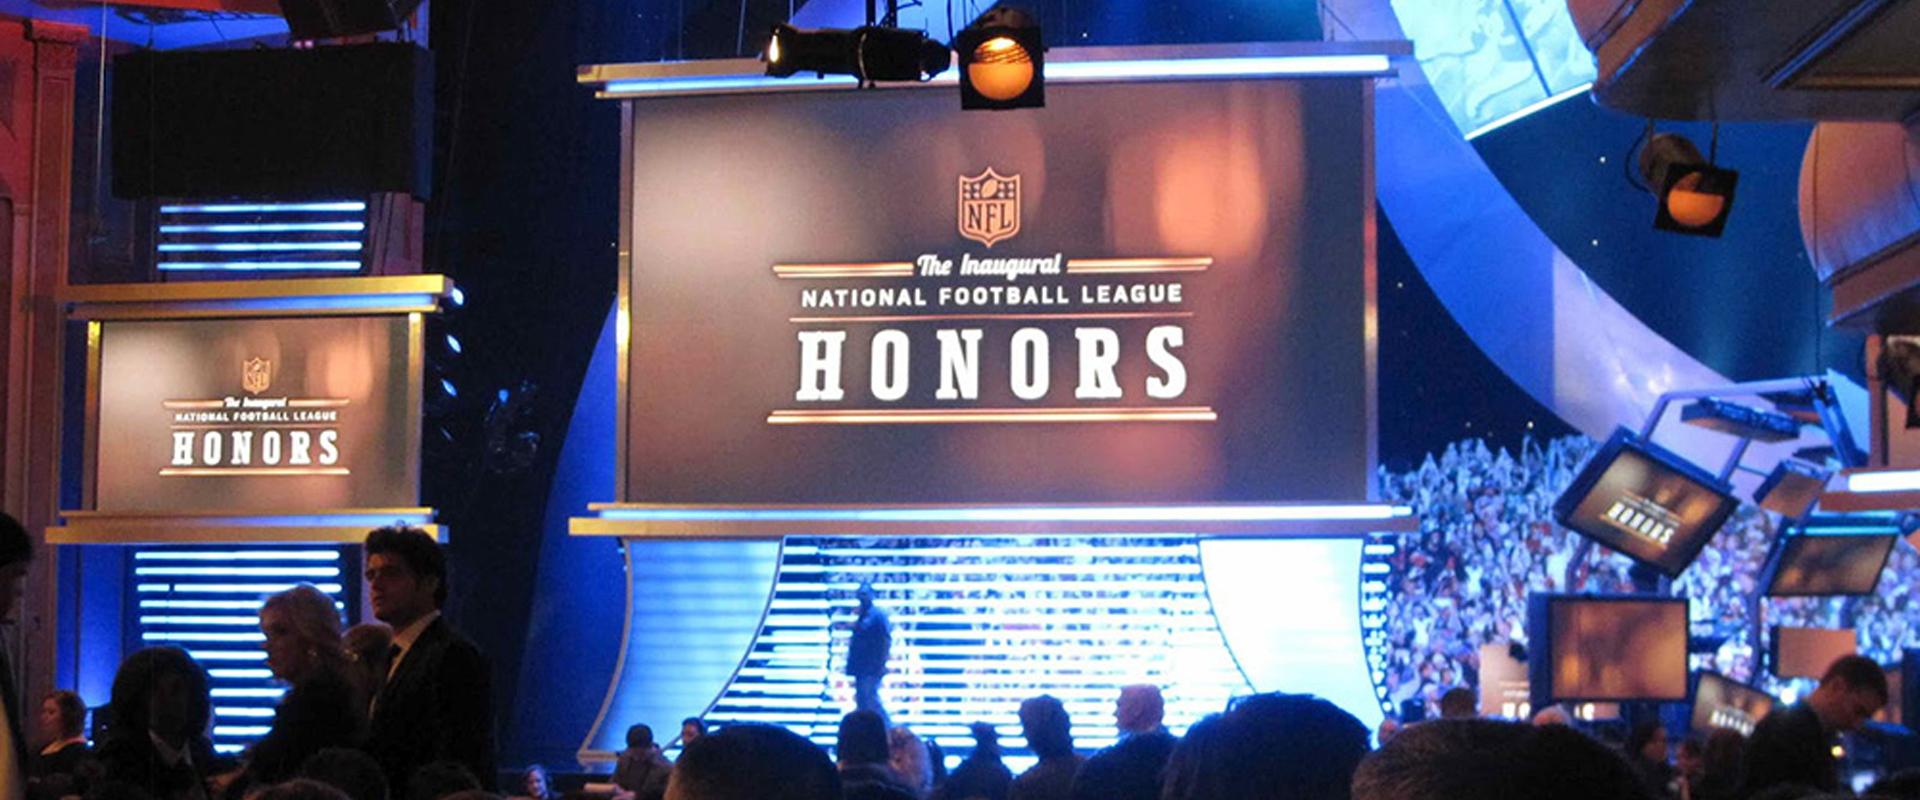 NFL Honours Award winners announced